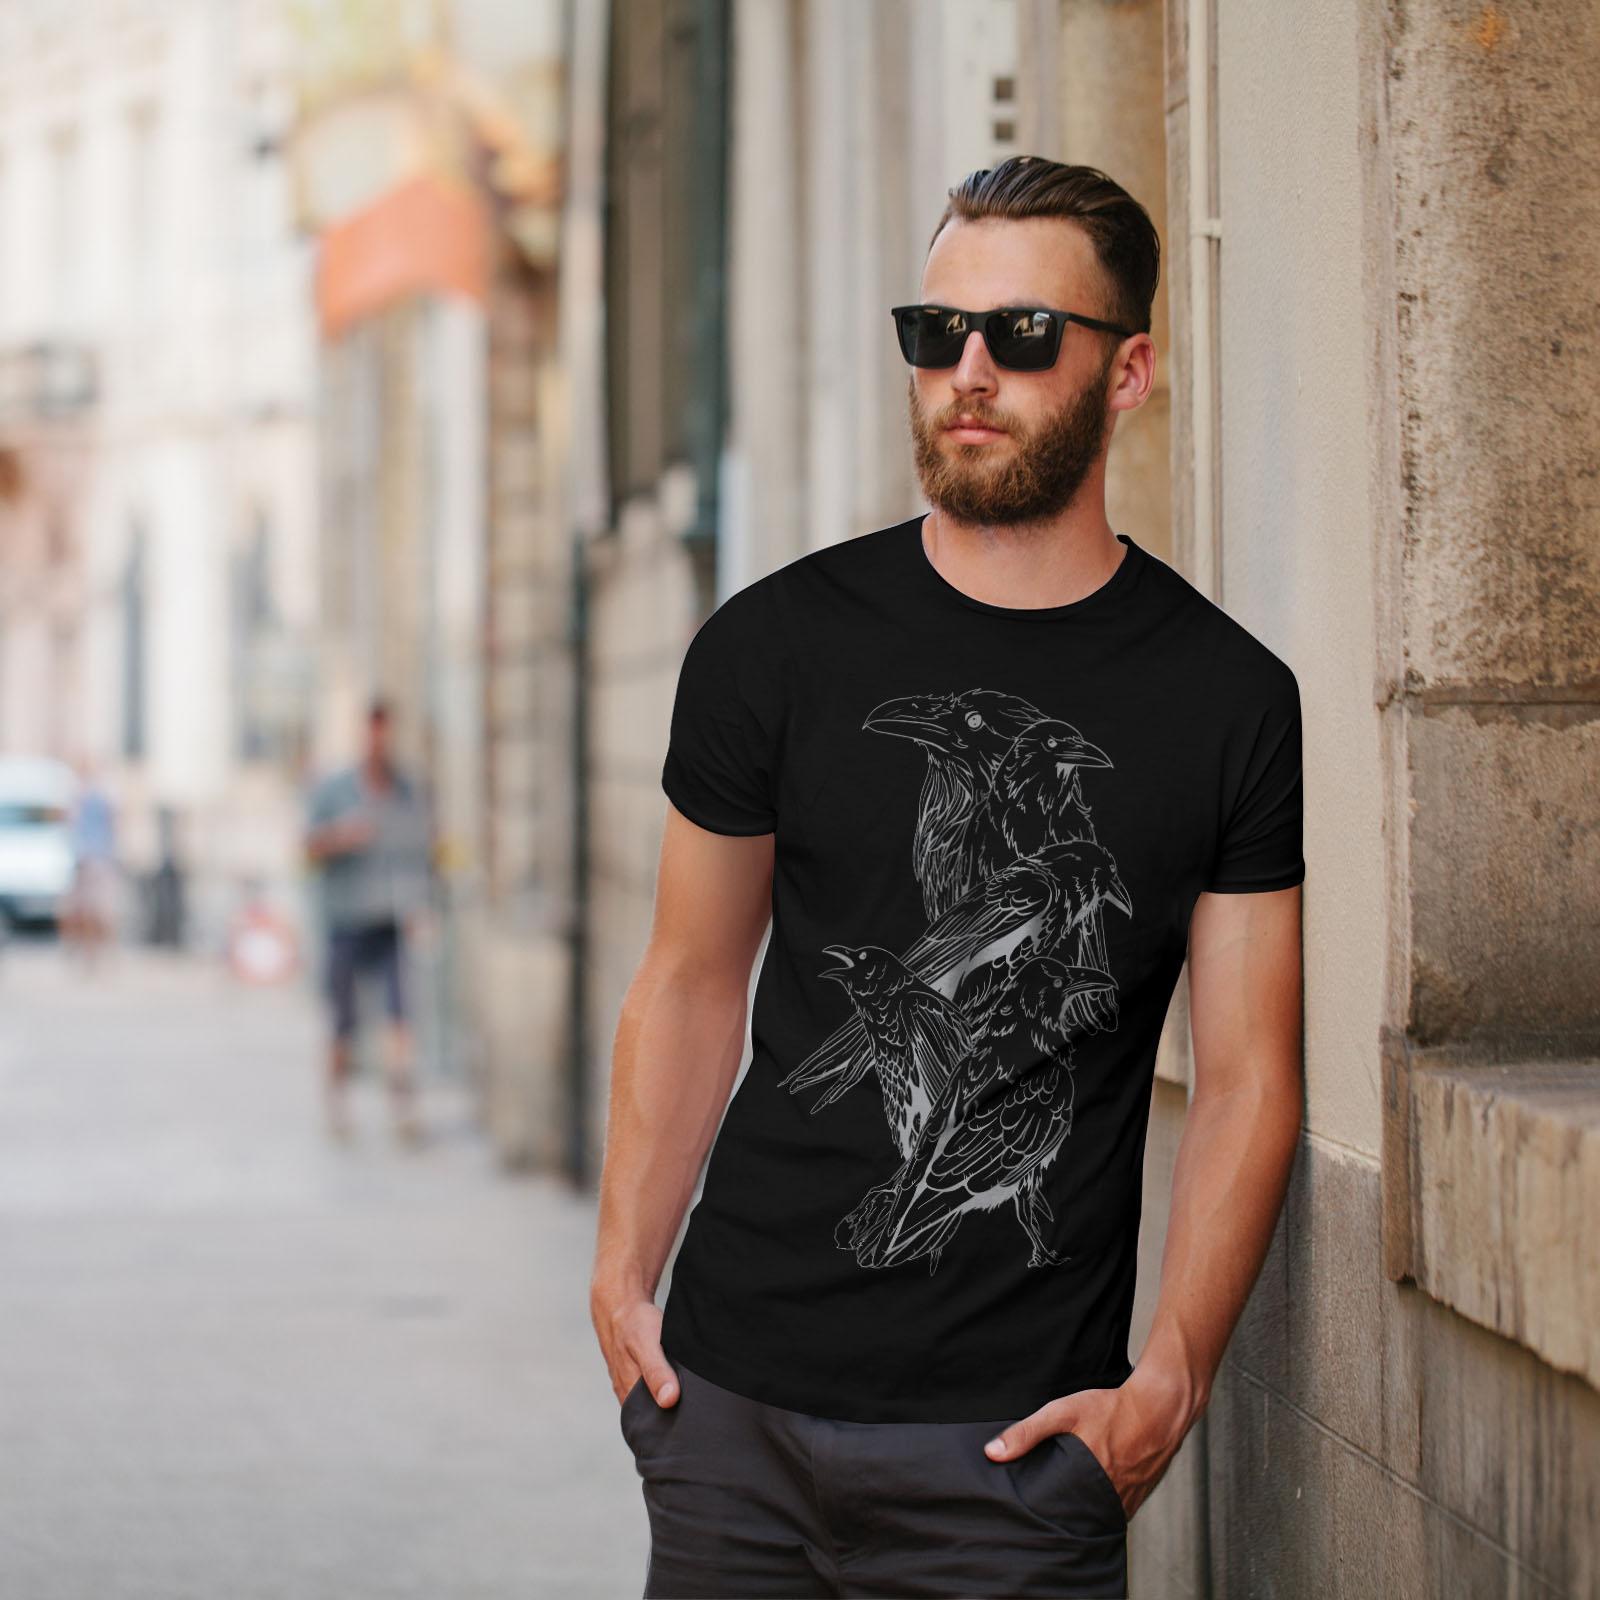 miniature 5 - Wellcoda Four Scary Raven Mens T-shirt, Crow Birds Graphic Design Printed Tee